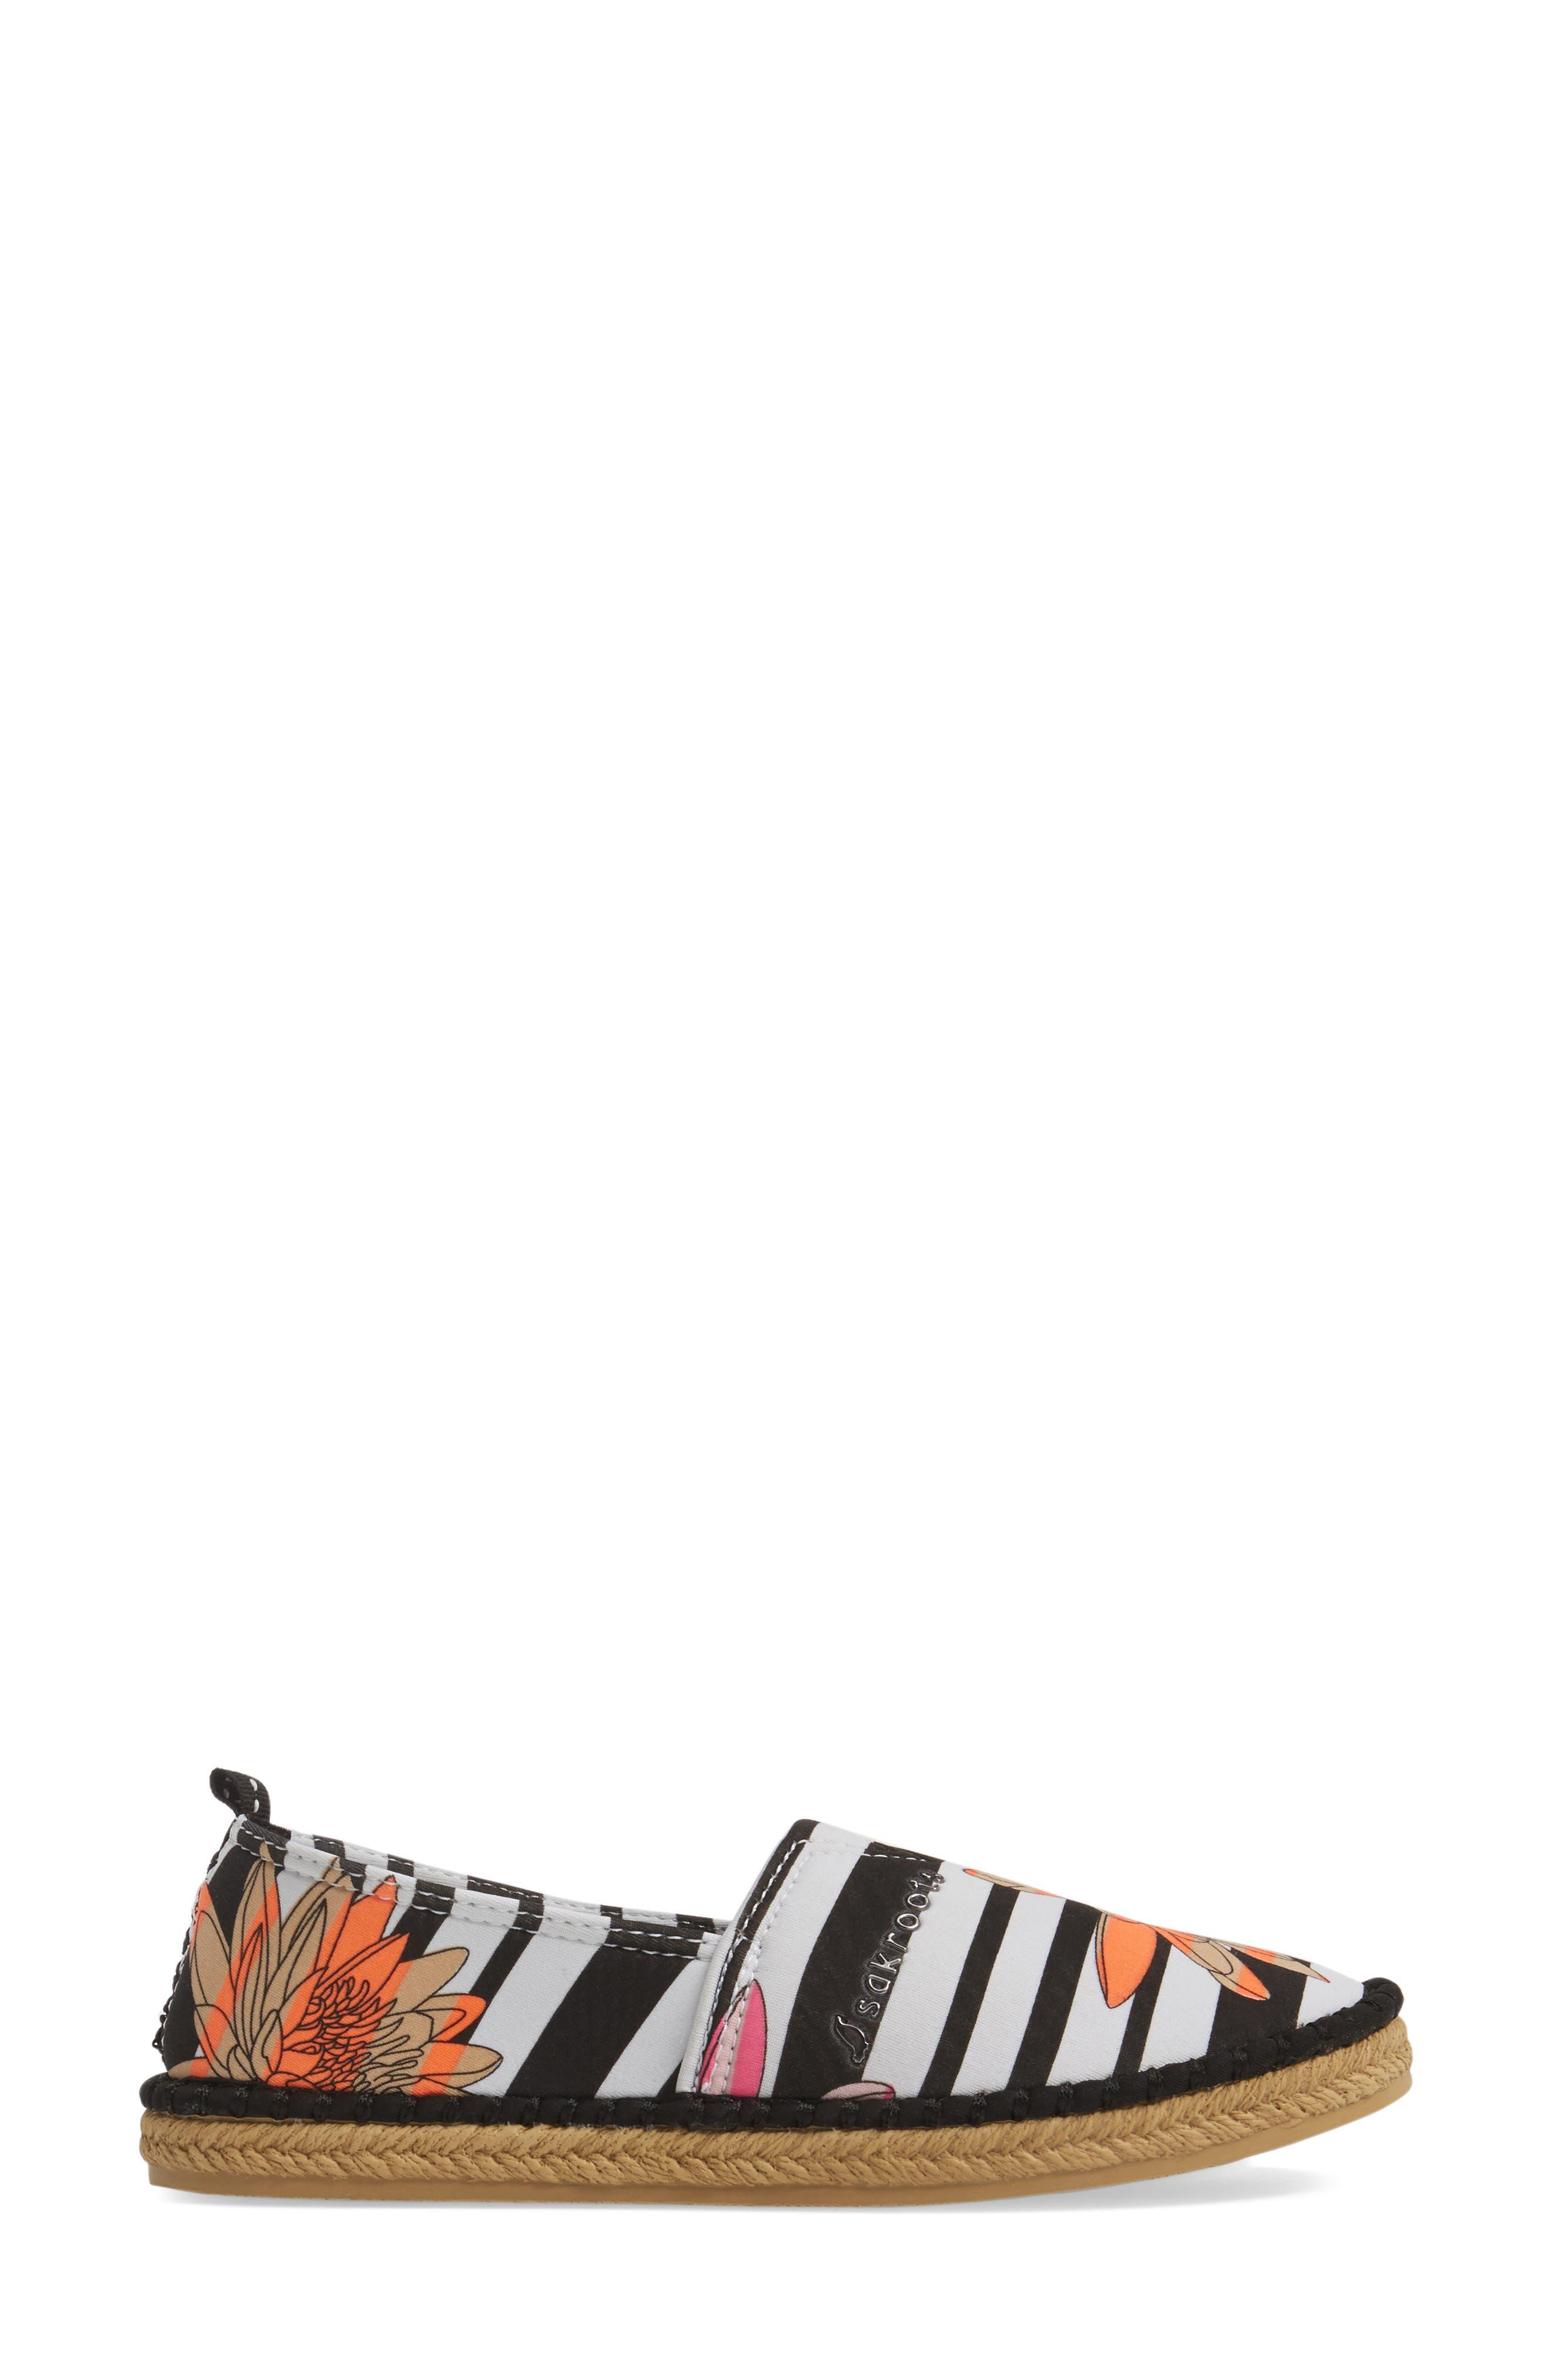 Eton Espadrille Flat,                             Alternate thumbnail 3, color,                             Neon Xen Flower Fabric